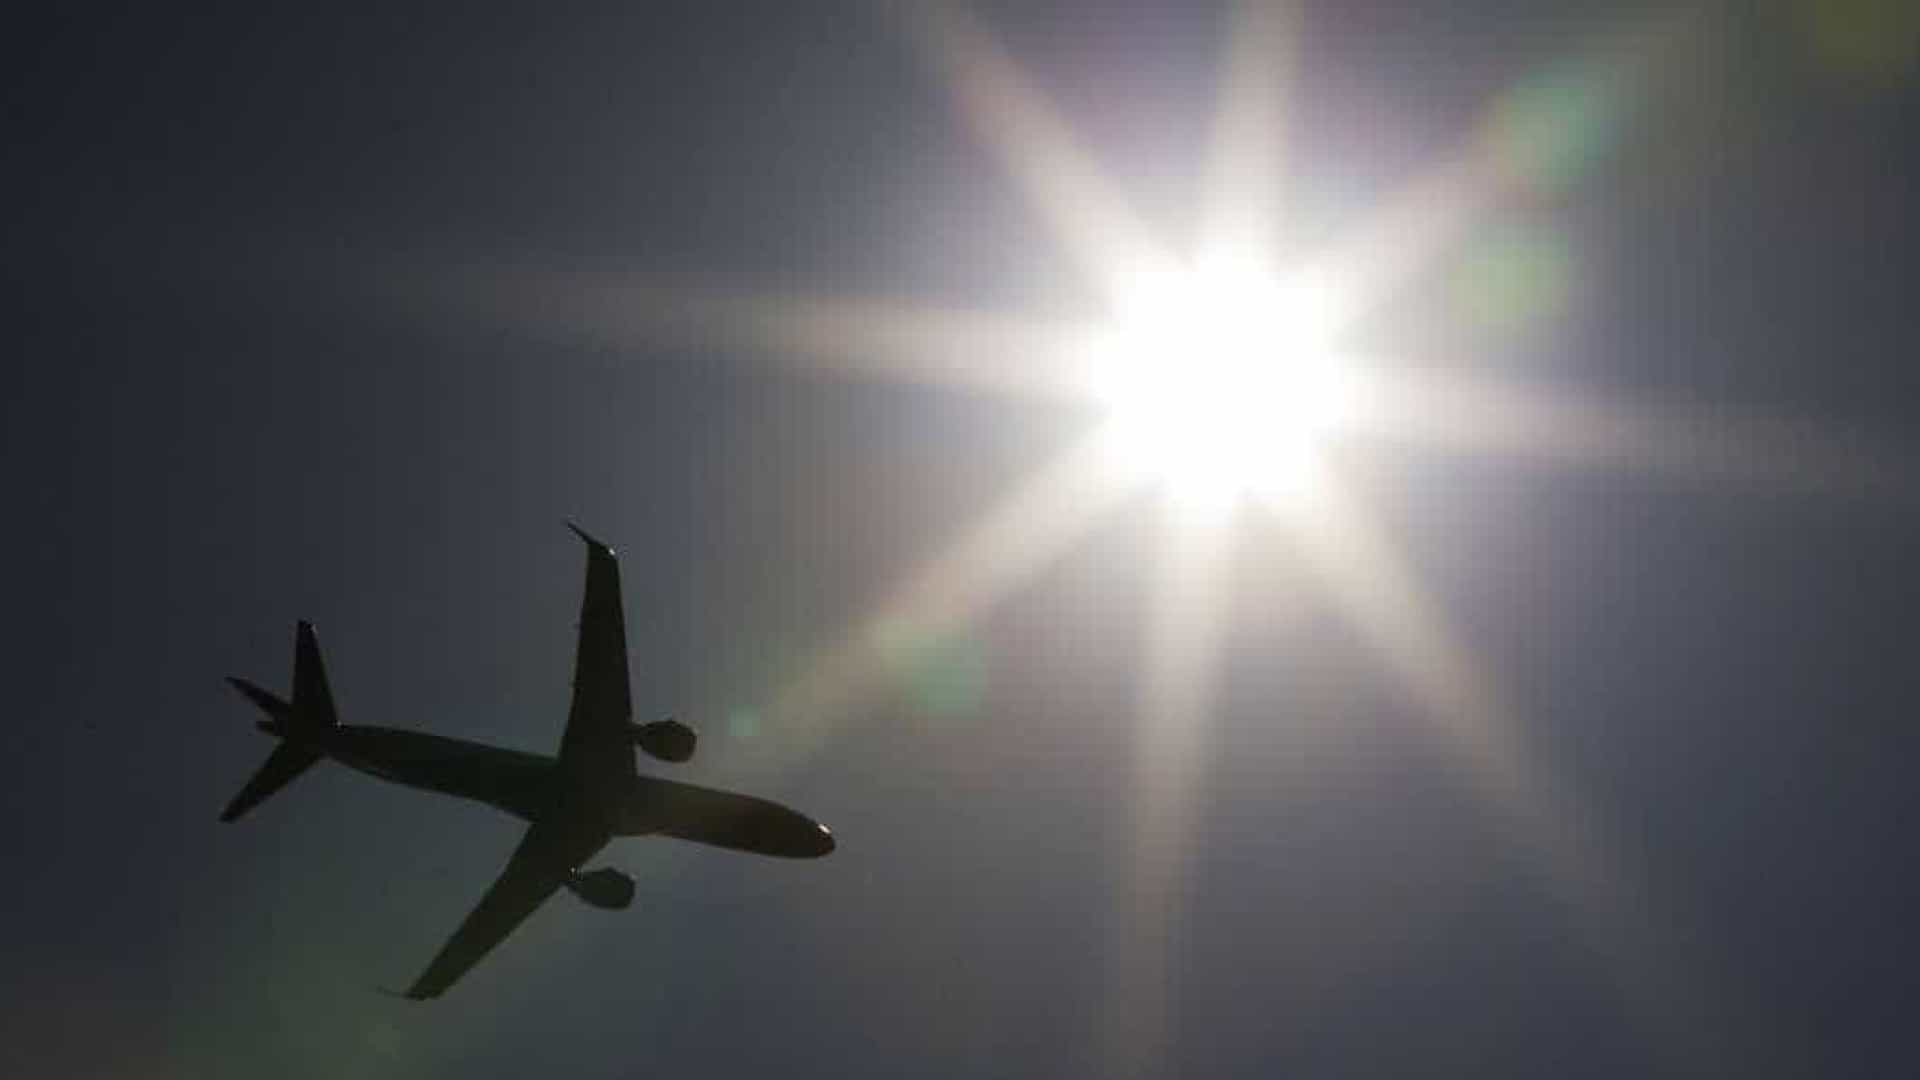 Pacote prevê cortar custo de combustível para baixar bilhetes aéreos